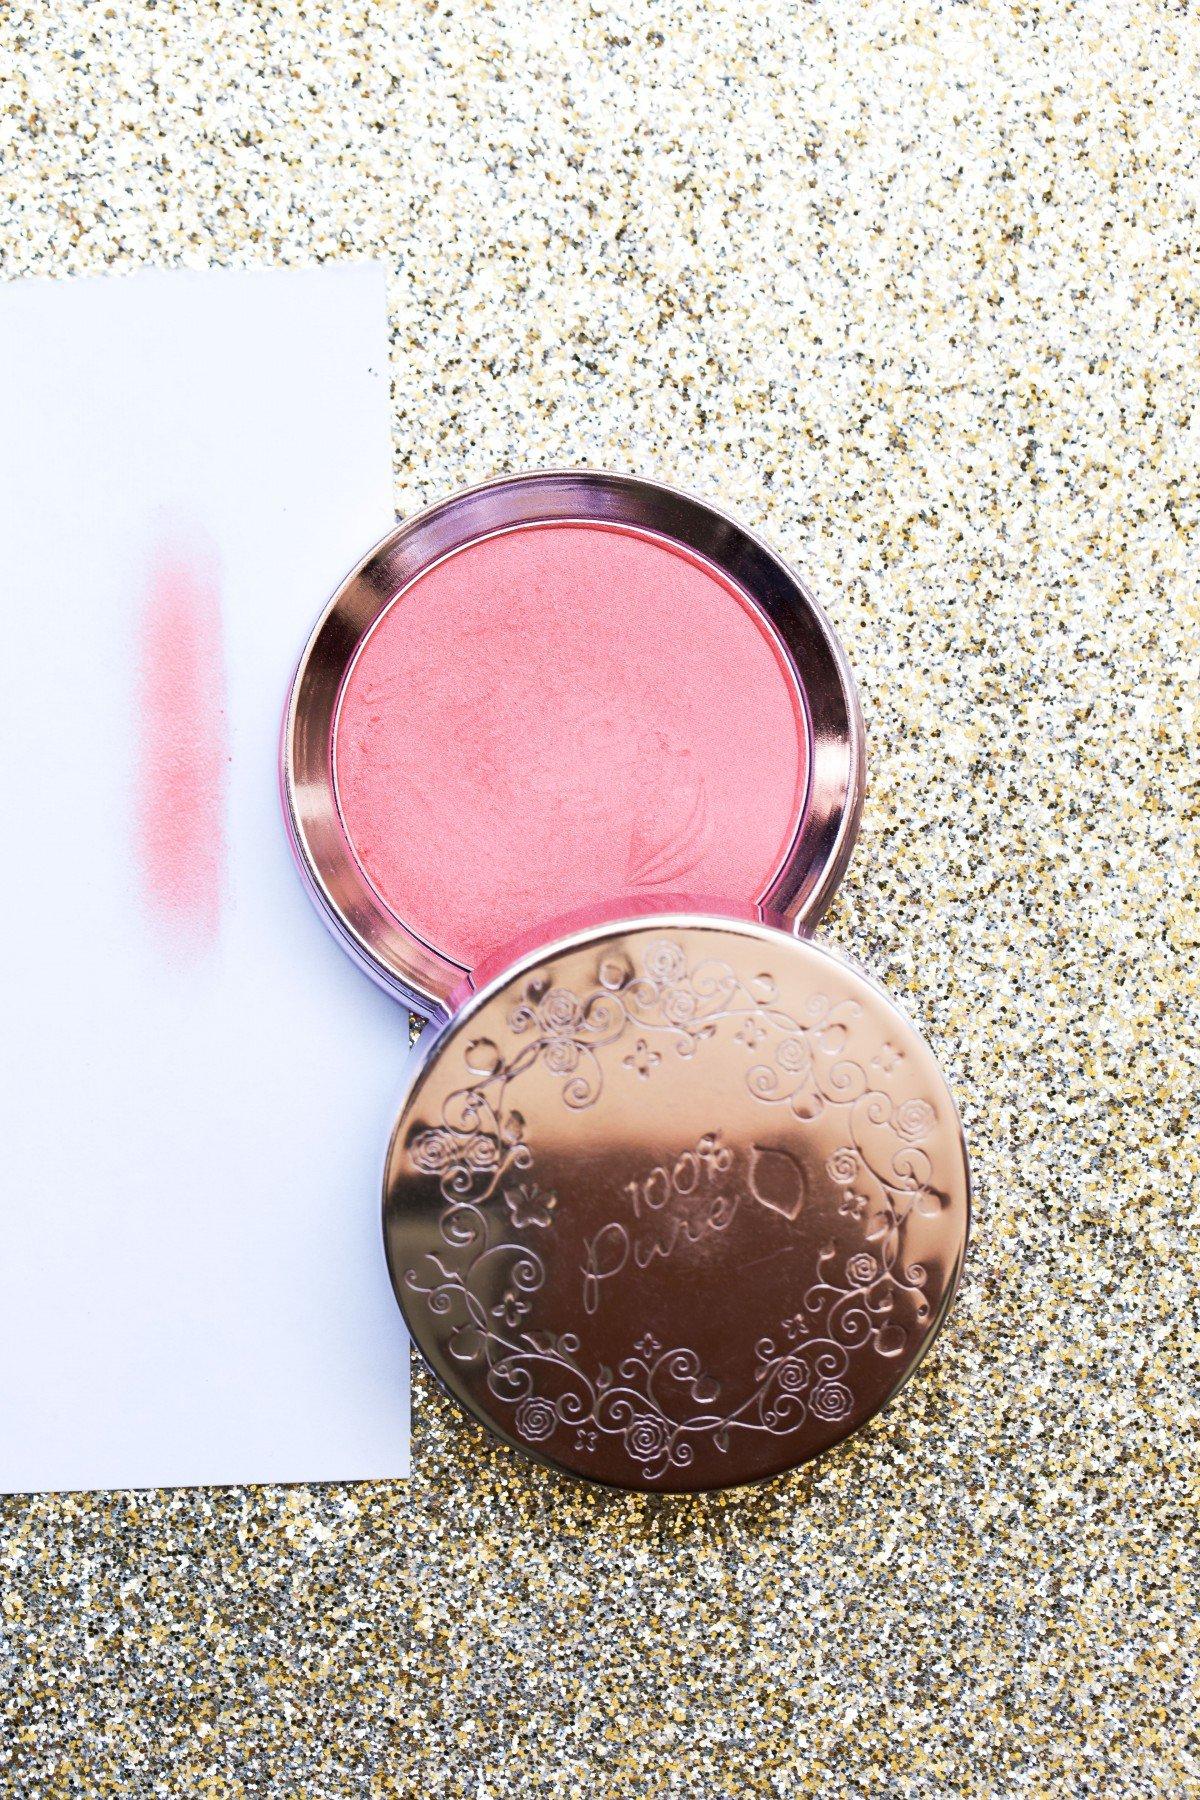 100 percent pure fruit pigmented blush makeup review makeup bag monday 49